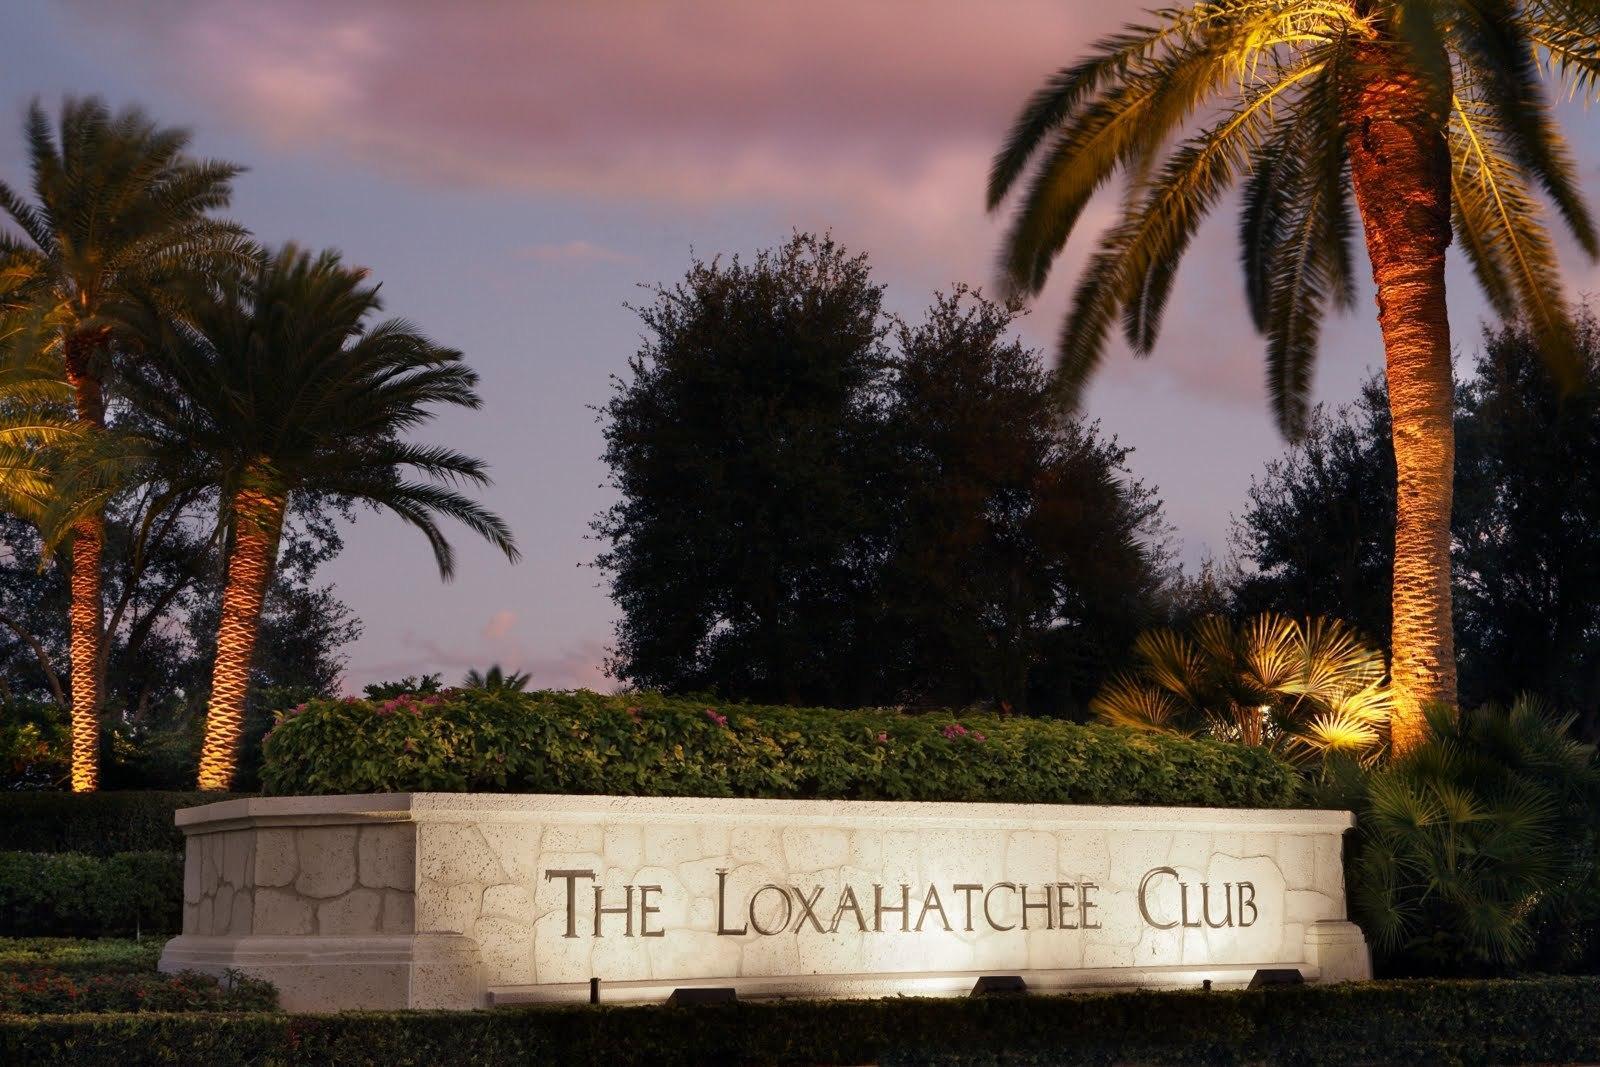 LOXAHATCHEE CLUB AT MAPLEWOOD PL 1 PH 2  LT 41 & LT 41-A OF LOXAHATCHEECLUB OF MAPLEWOOD PL 2 PH 2